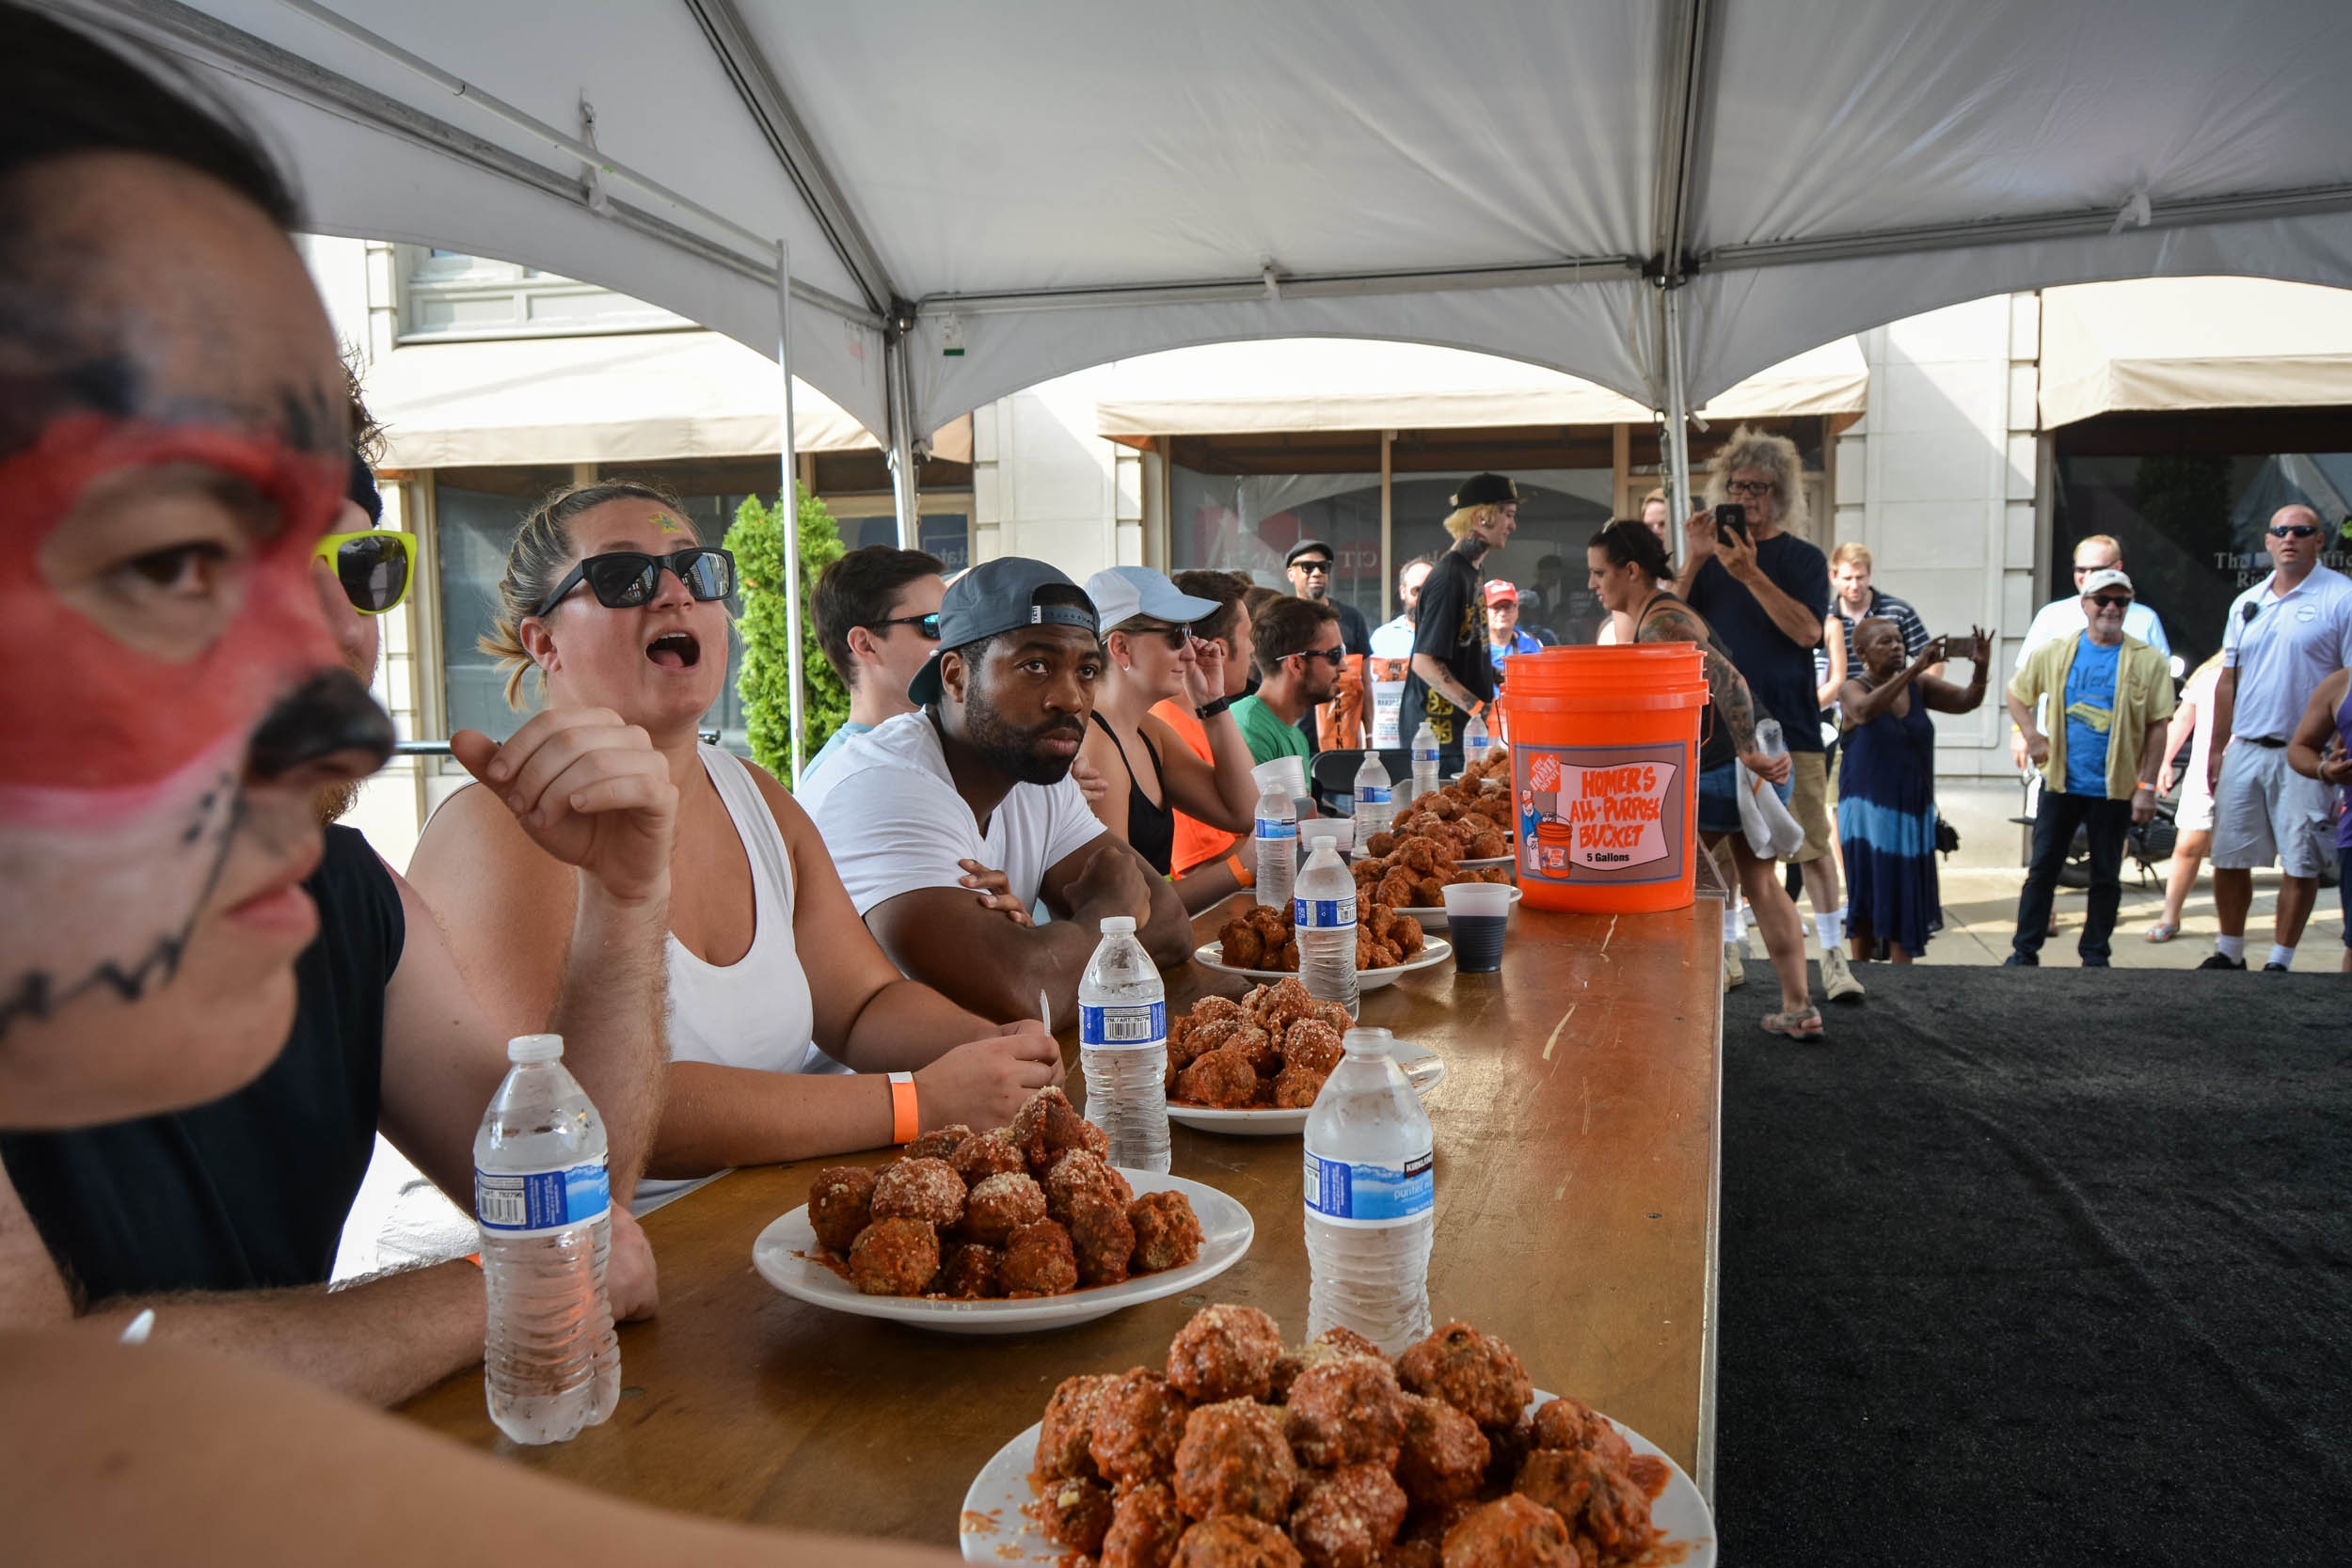 Monroe Avenue Festival Grandmas Meatball Eating Contest0011.jpg